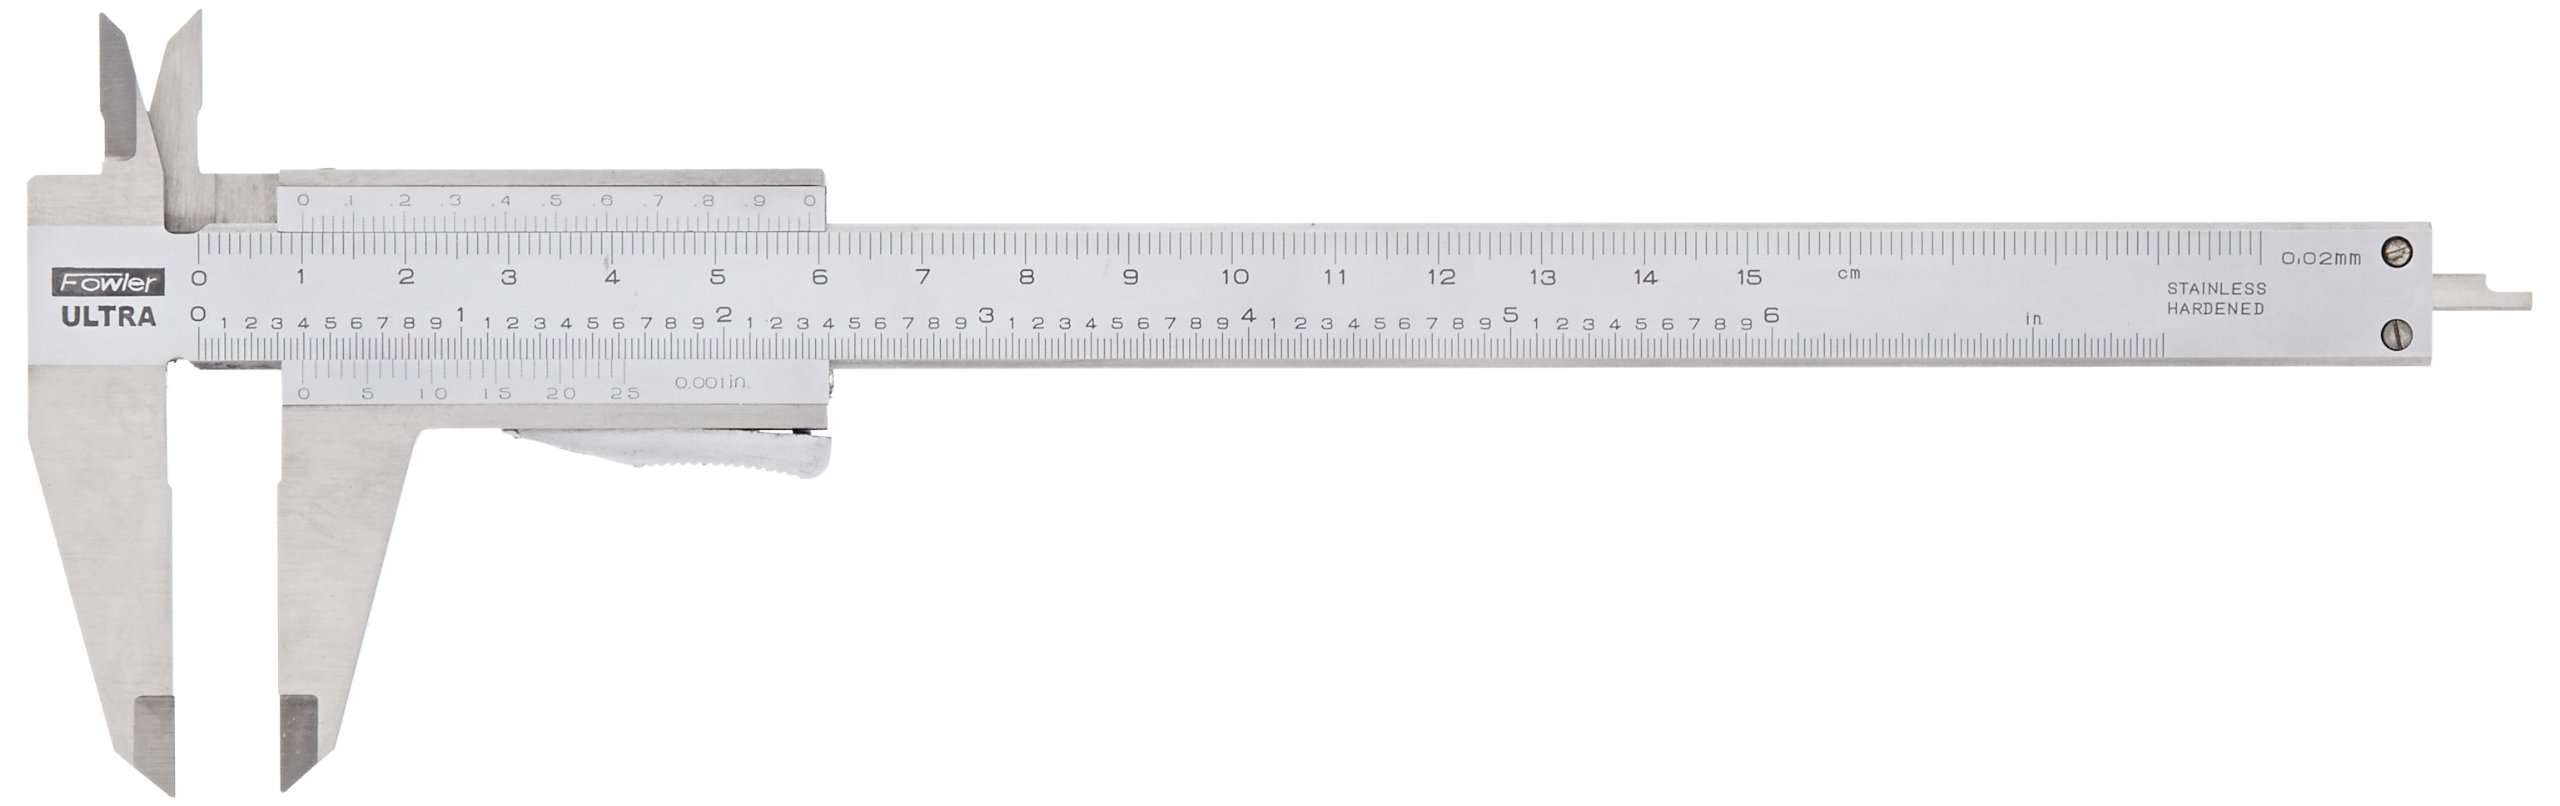 52-060-016-0 - Vernier Caliper - Parallax Free with Thumb Lock